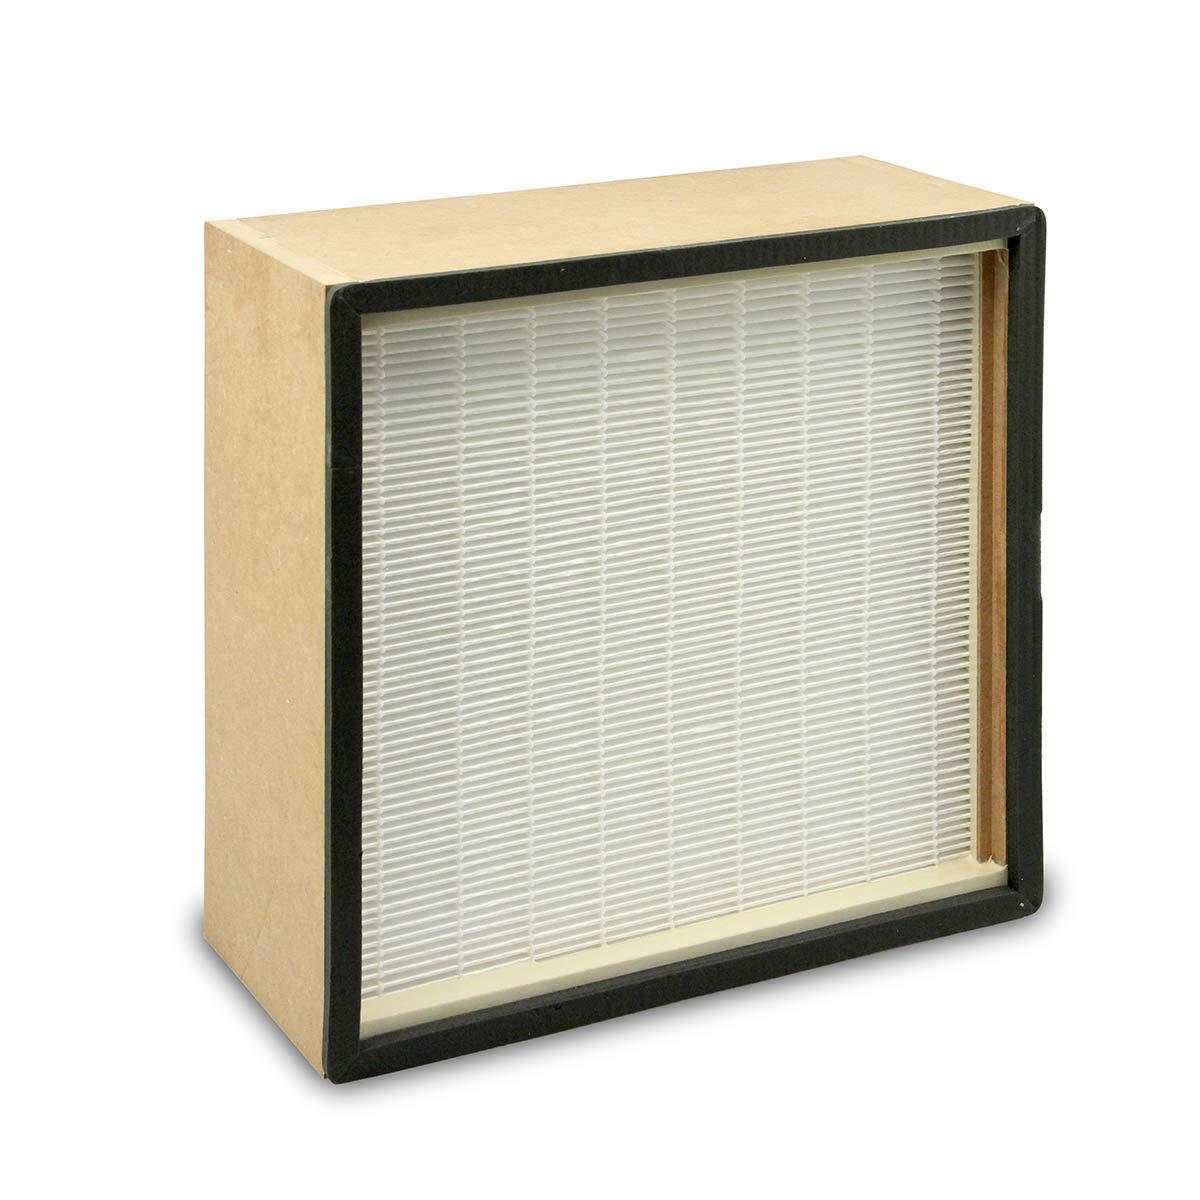 Schwebstofffilter H13, zu TAC 5000, 510 x 510 x 292 mm